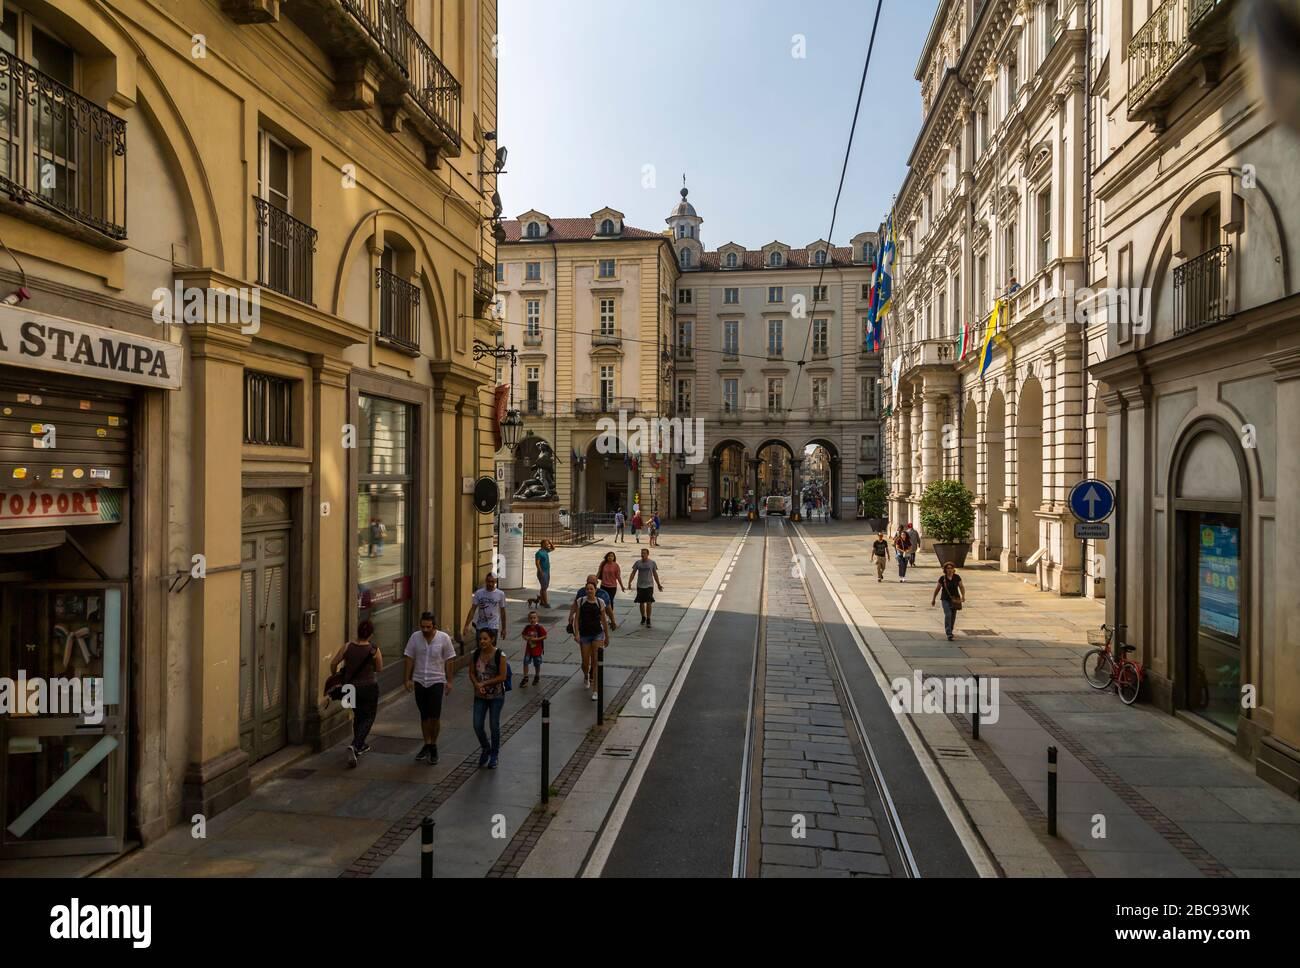 Vista elevada de la calle cerca del Duomo, Turín, Piamonte, Italia, Europa Foto de stock